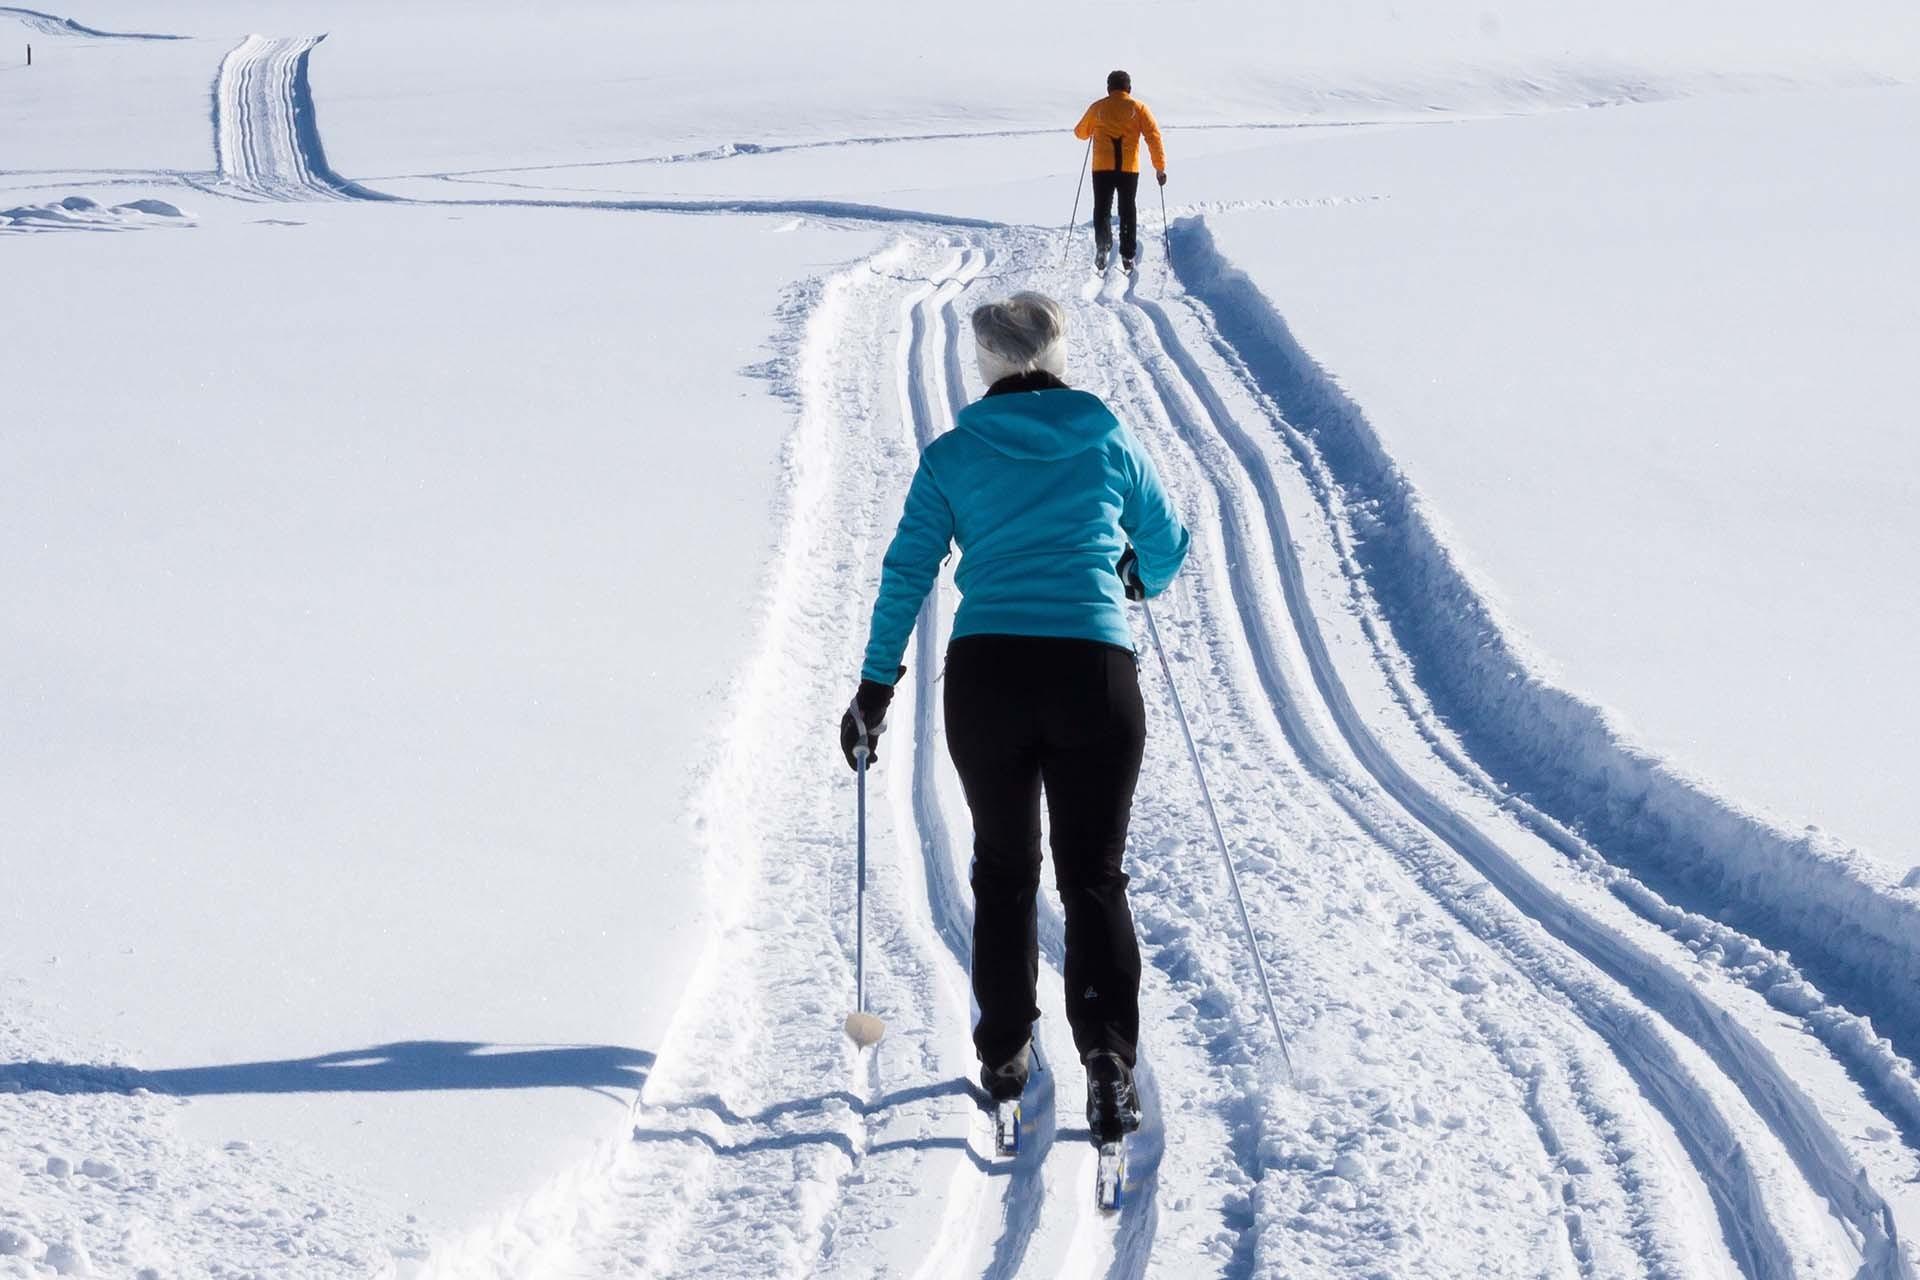 Cross-country skis rental